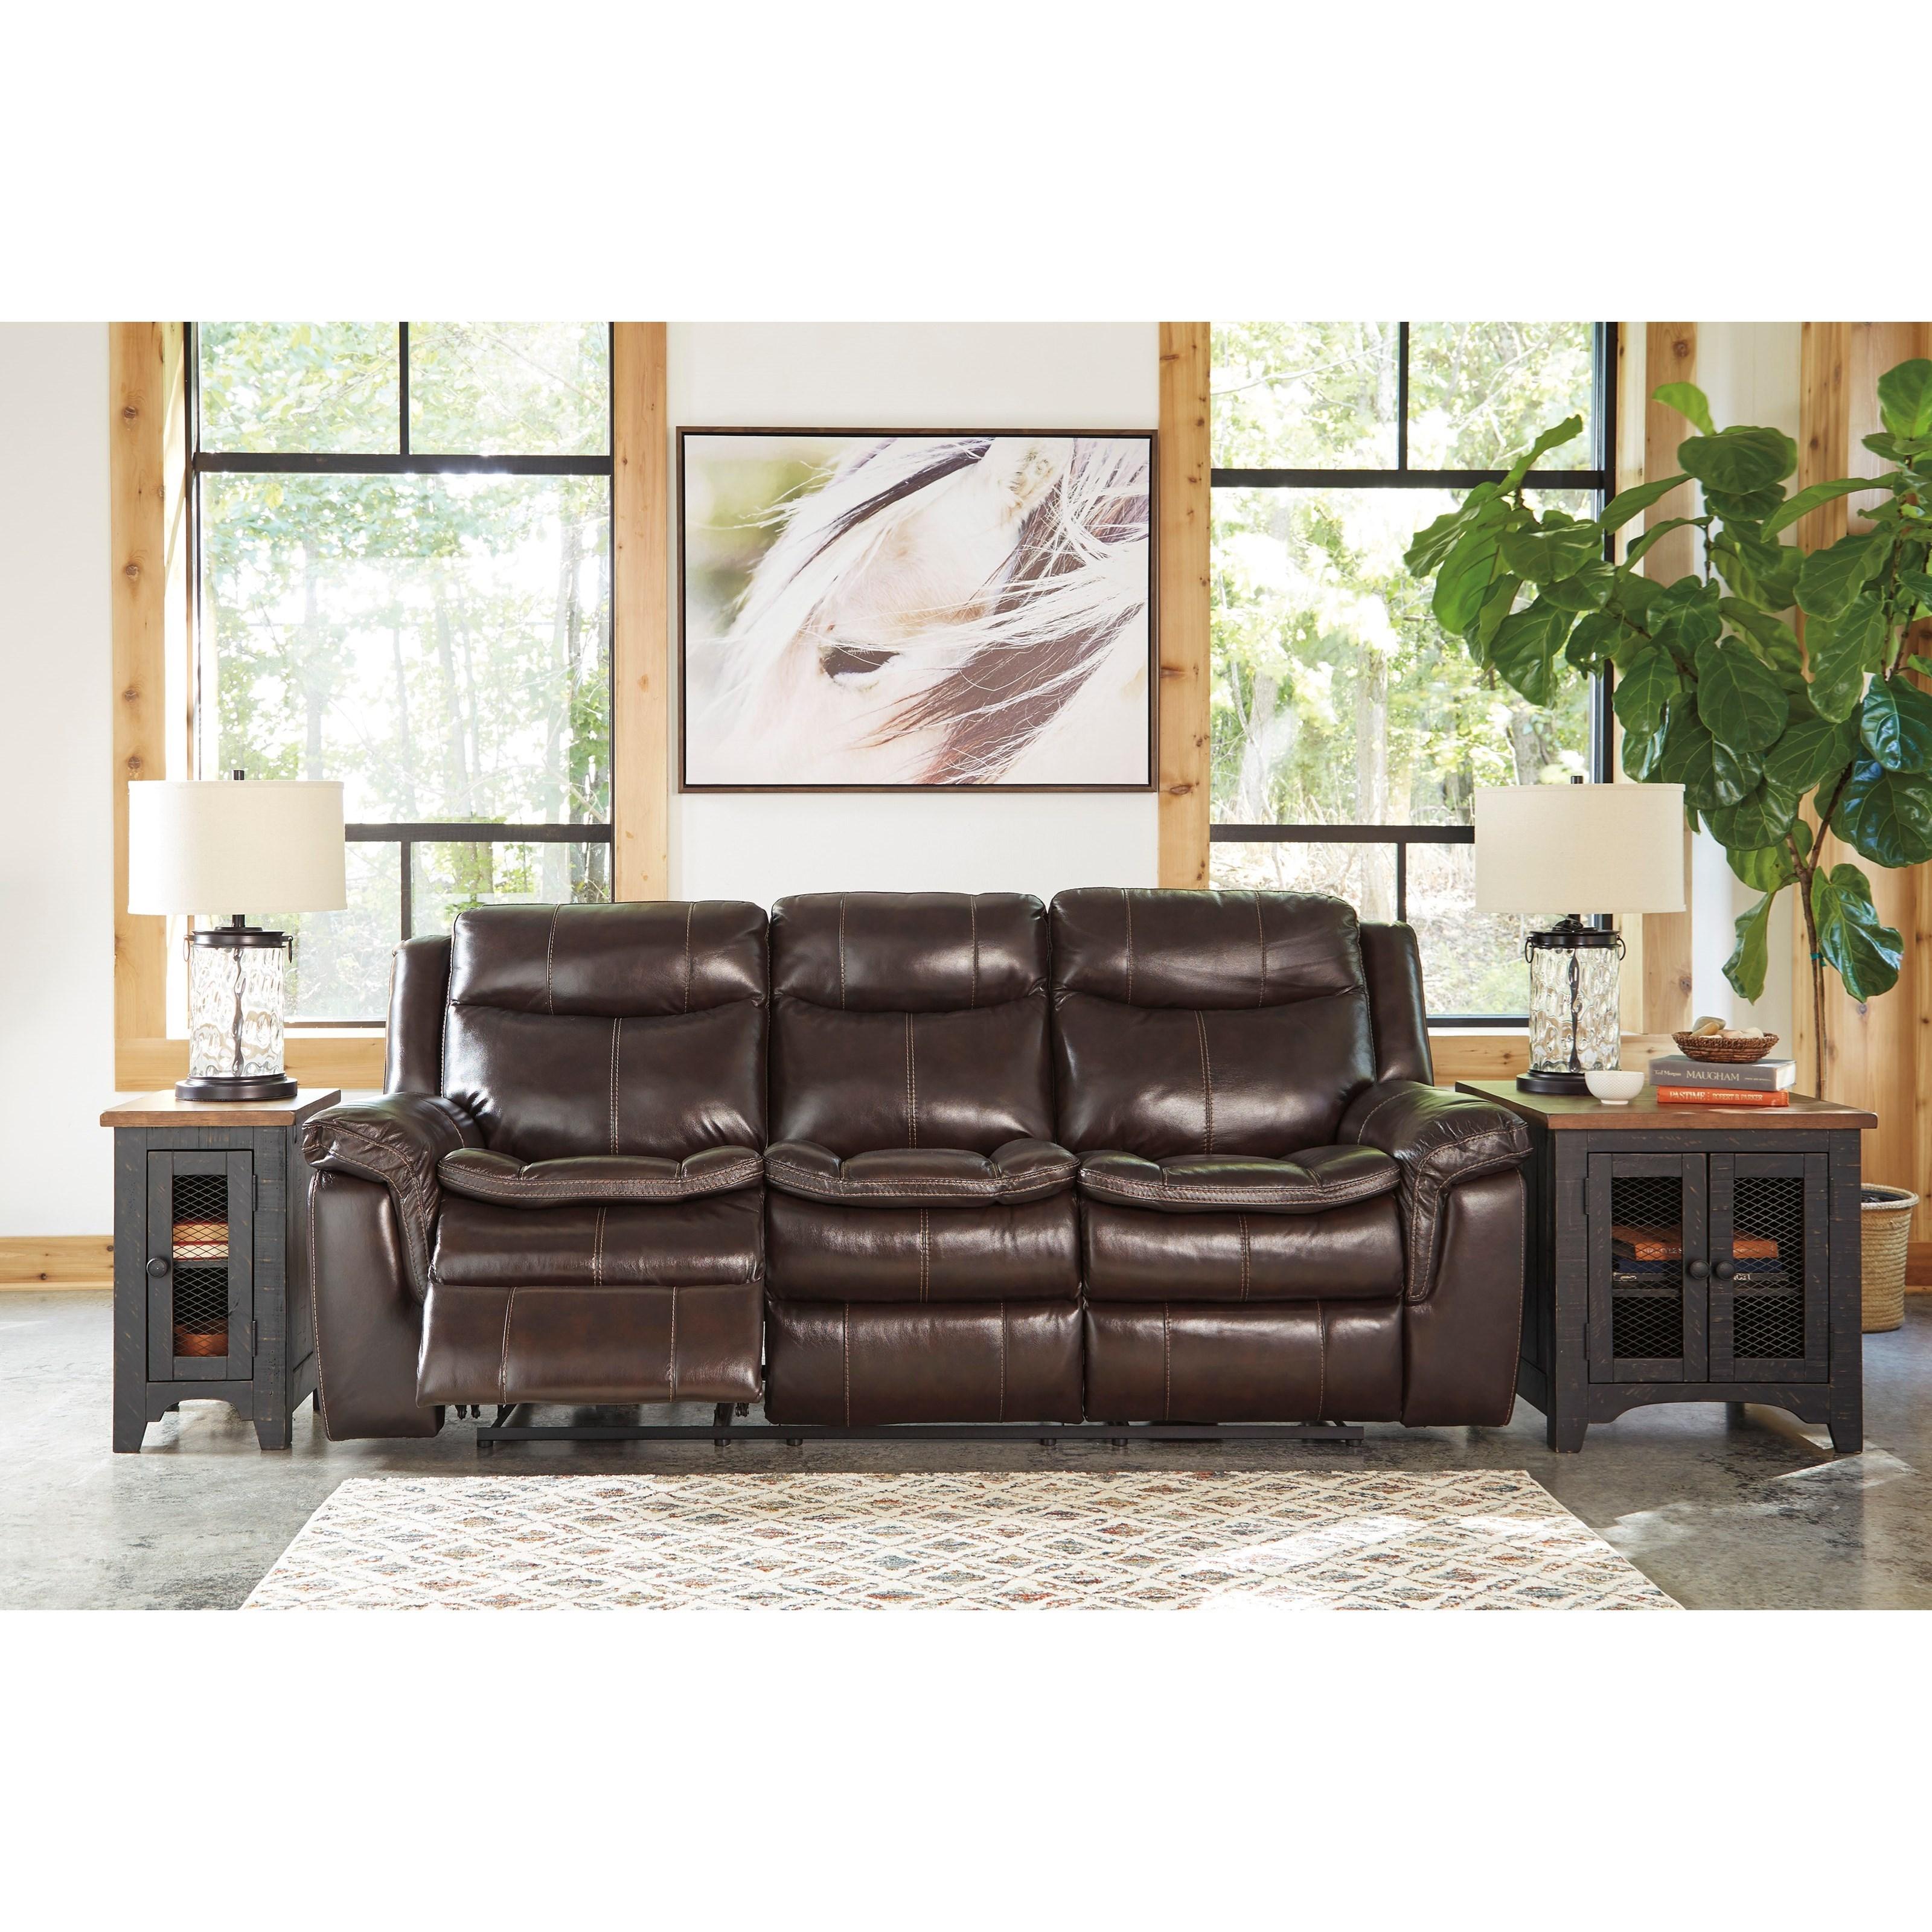 Ashley Furniture Manufacturer: Signature Design By Ashley Lockesburg Power Reclining Sofa